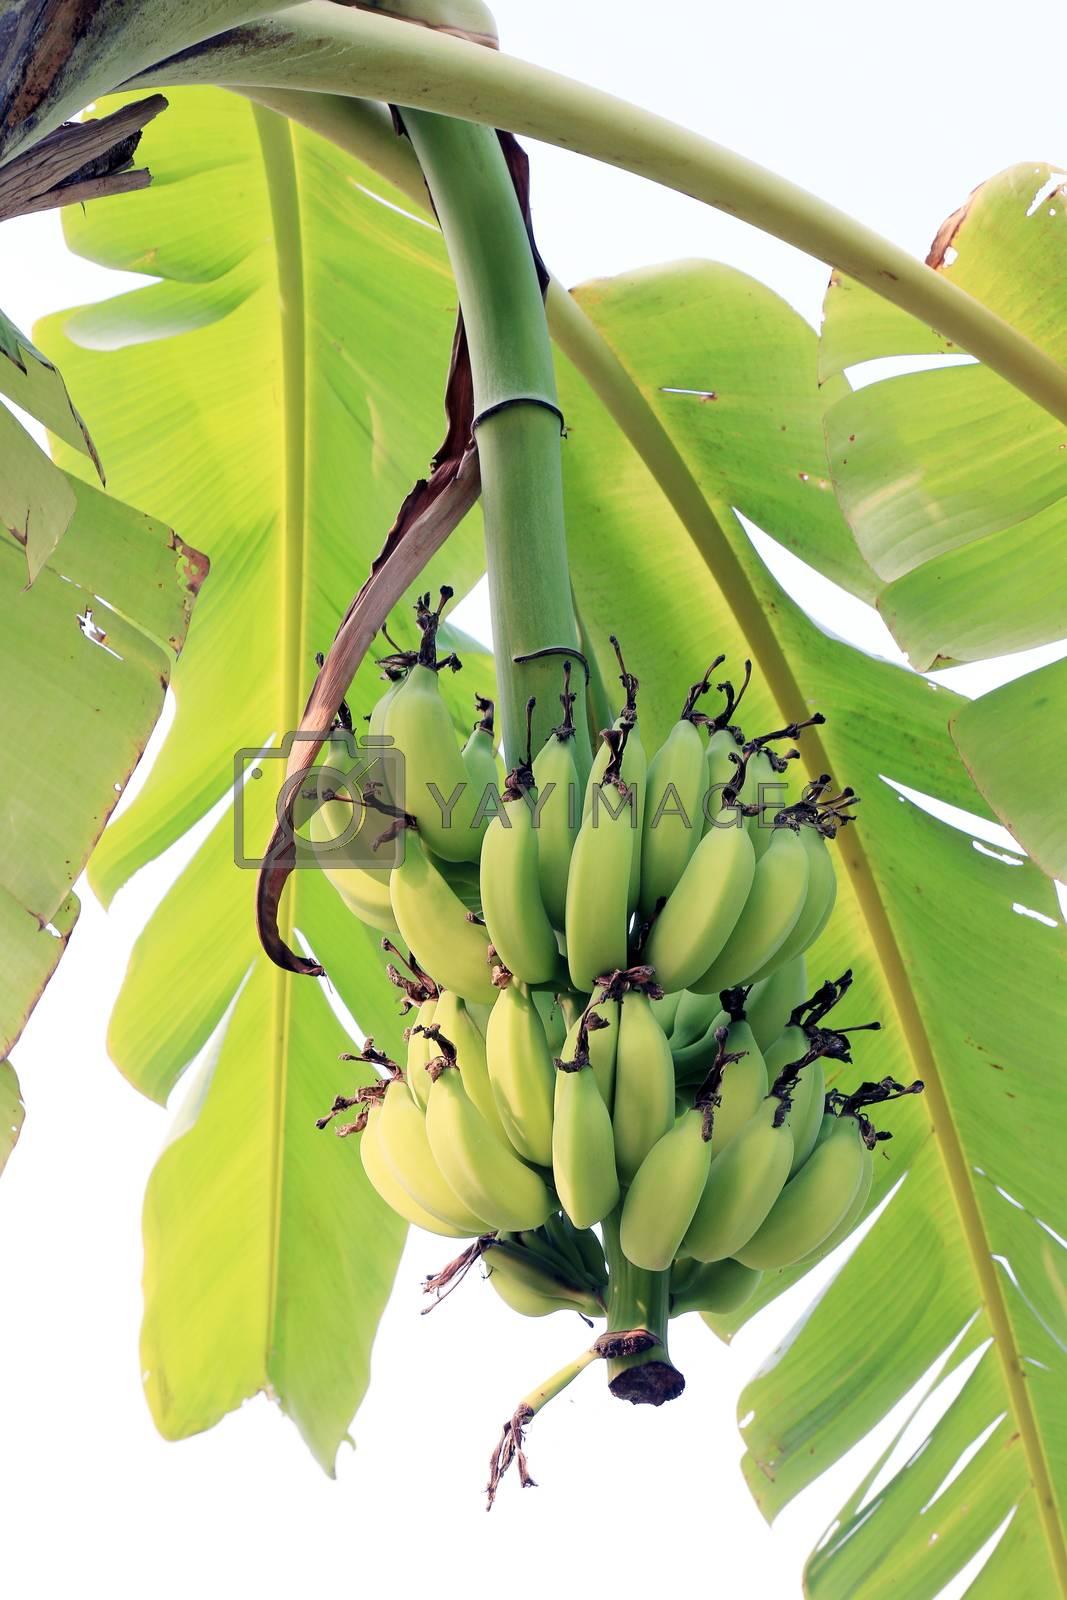 Royalty free image of banana bunch green on tree banana nature by cgdeaw